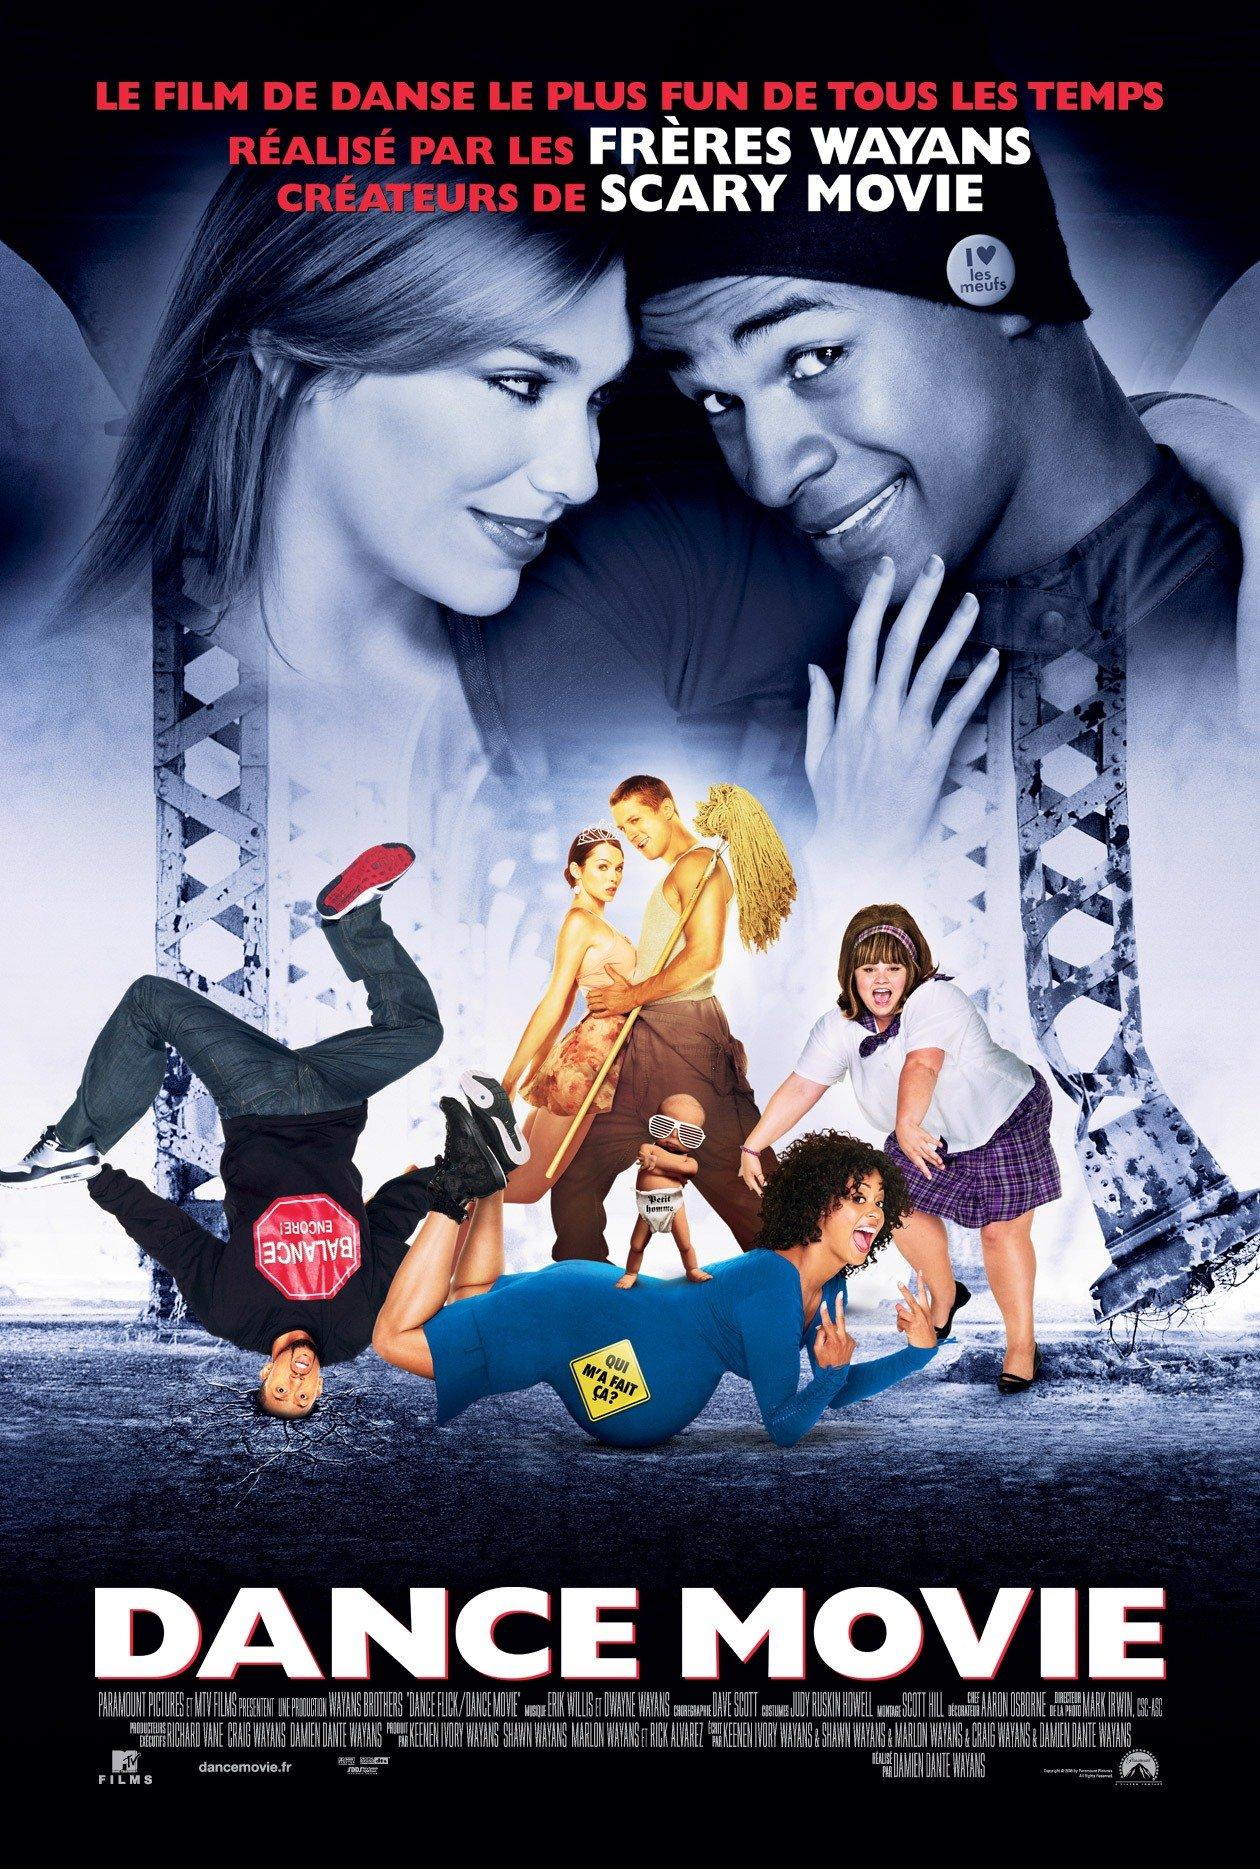 Free dans movie